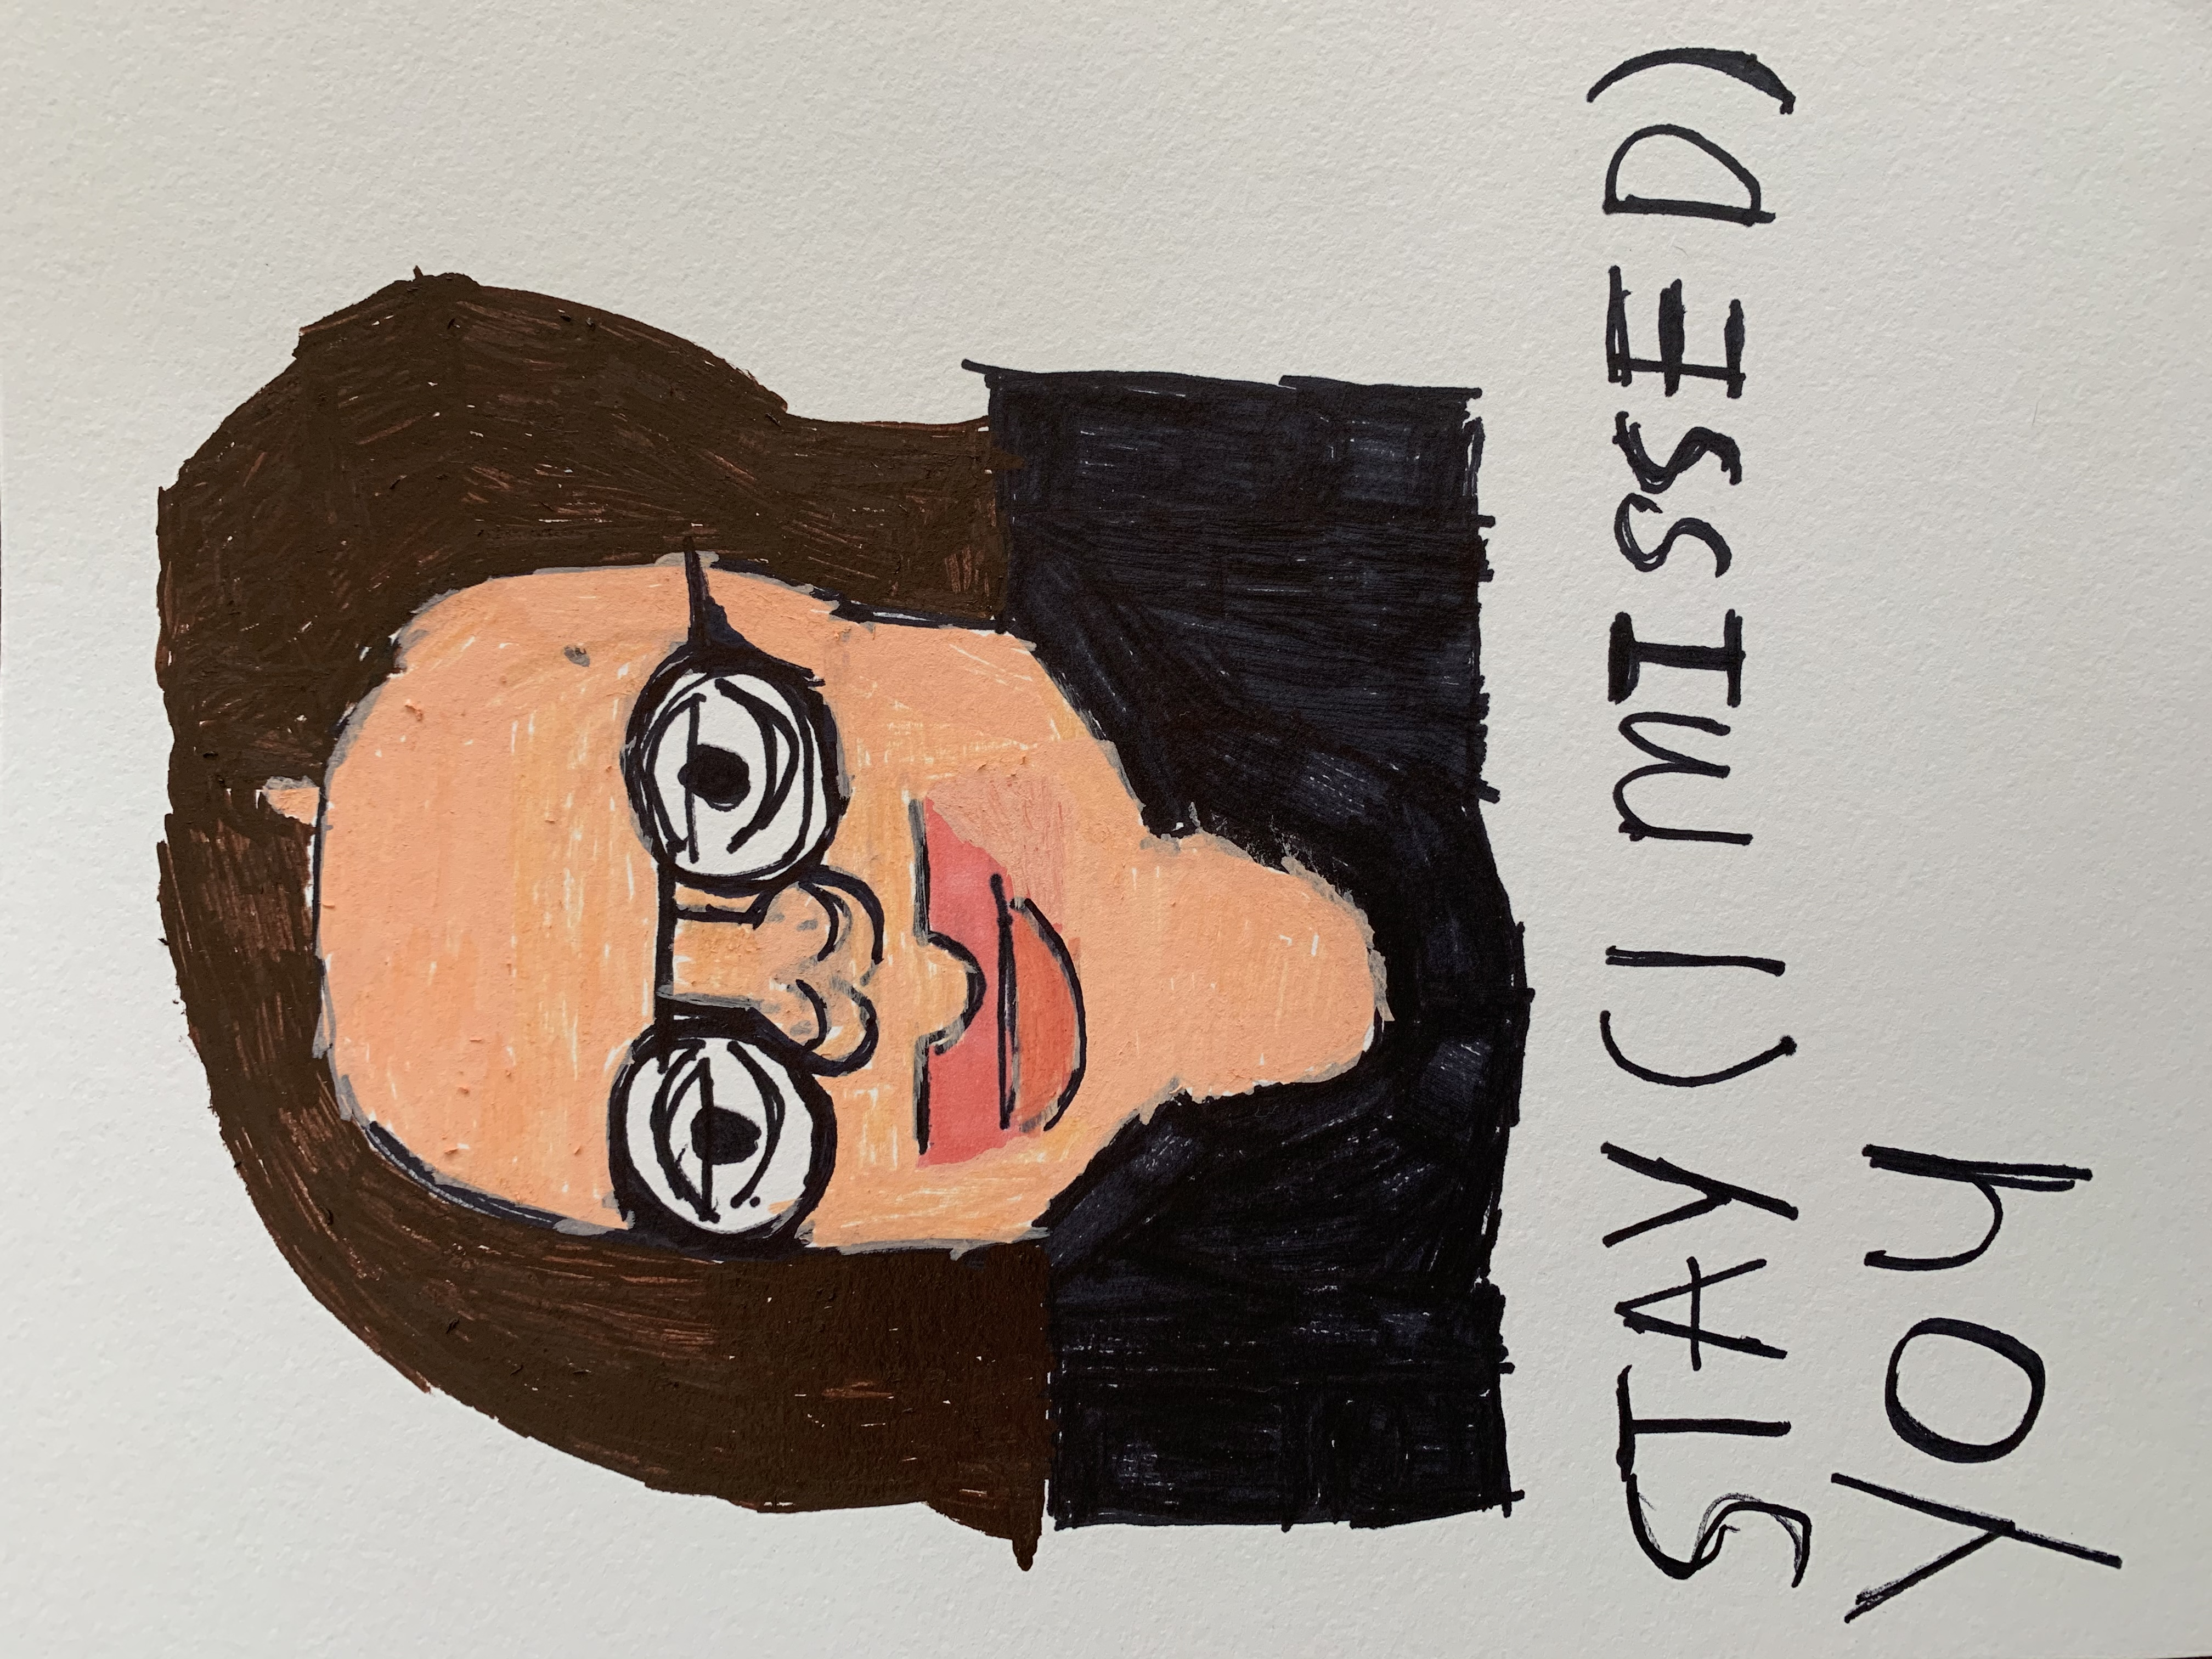 Lisa Loeb by Rick Fleming